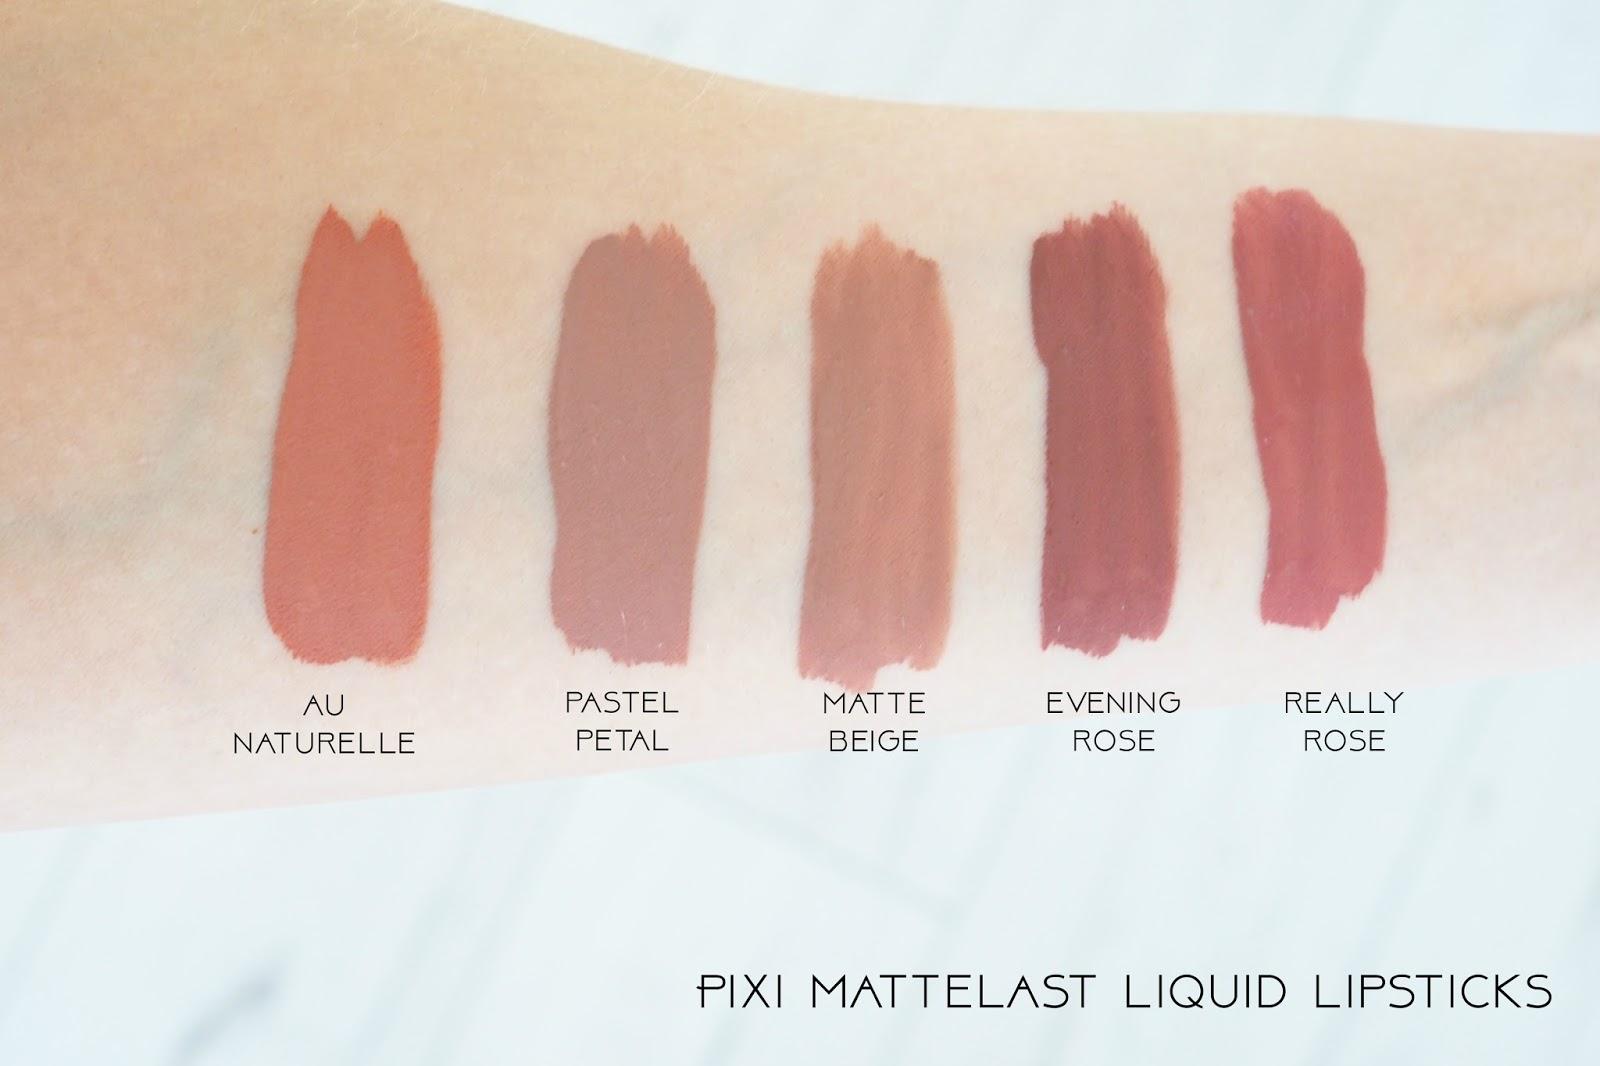 PIXI MatteLast Liquid Lipstick swatches in Pastel Petal, Matte Beige, Really Rose, Au Naturelle and Evening Rose